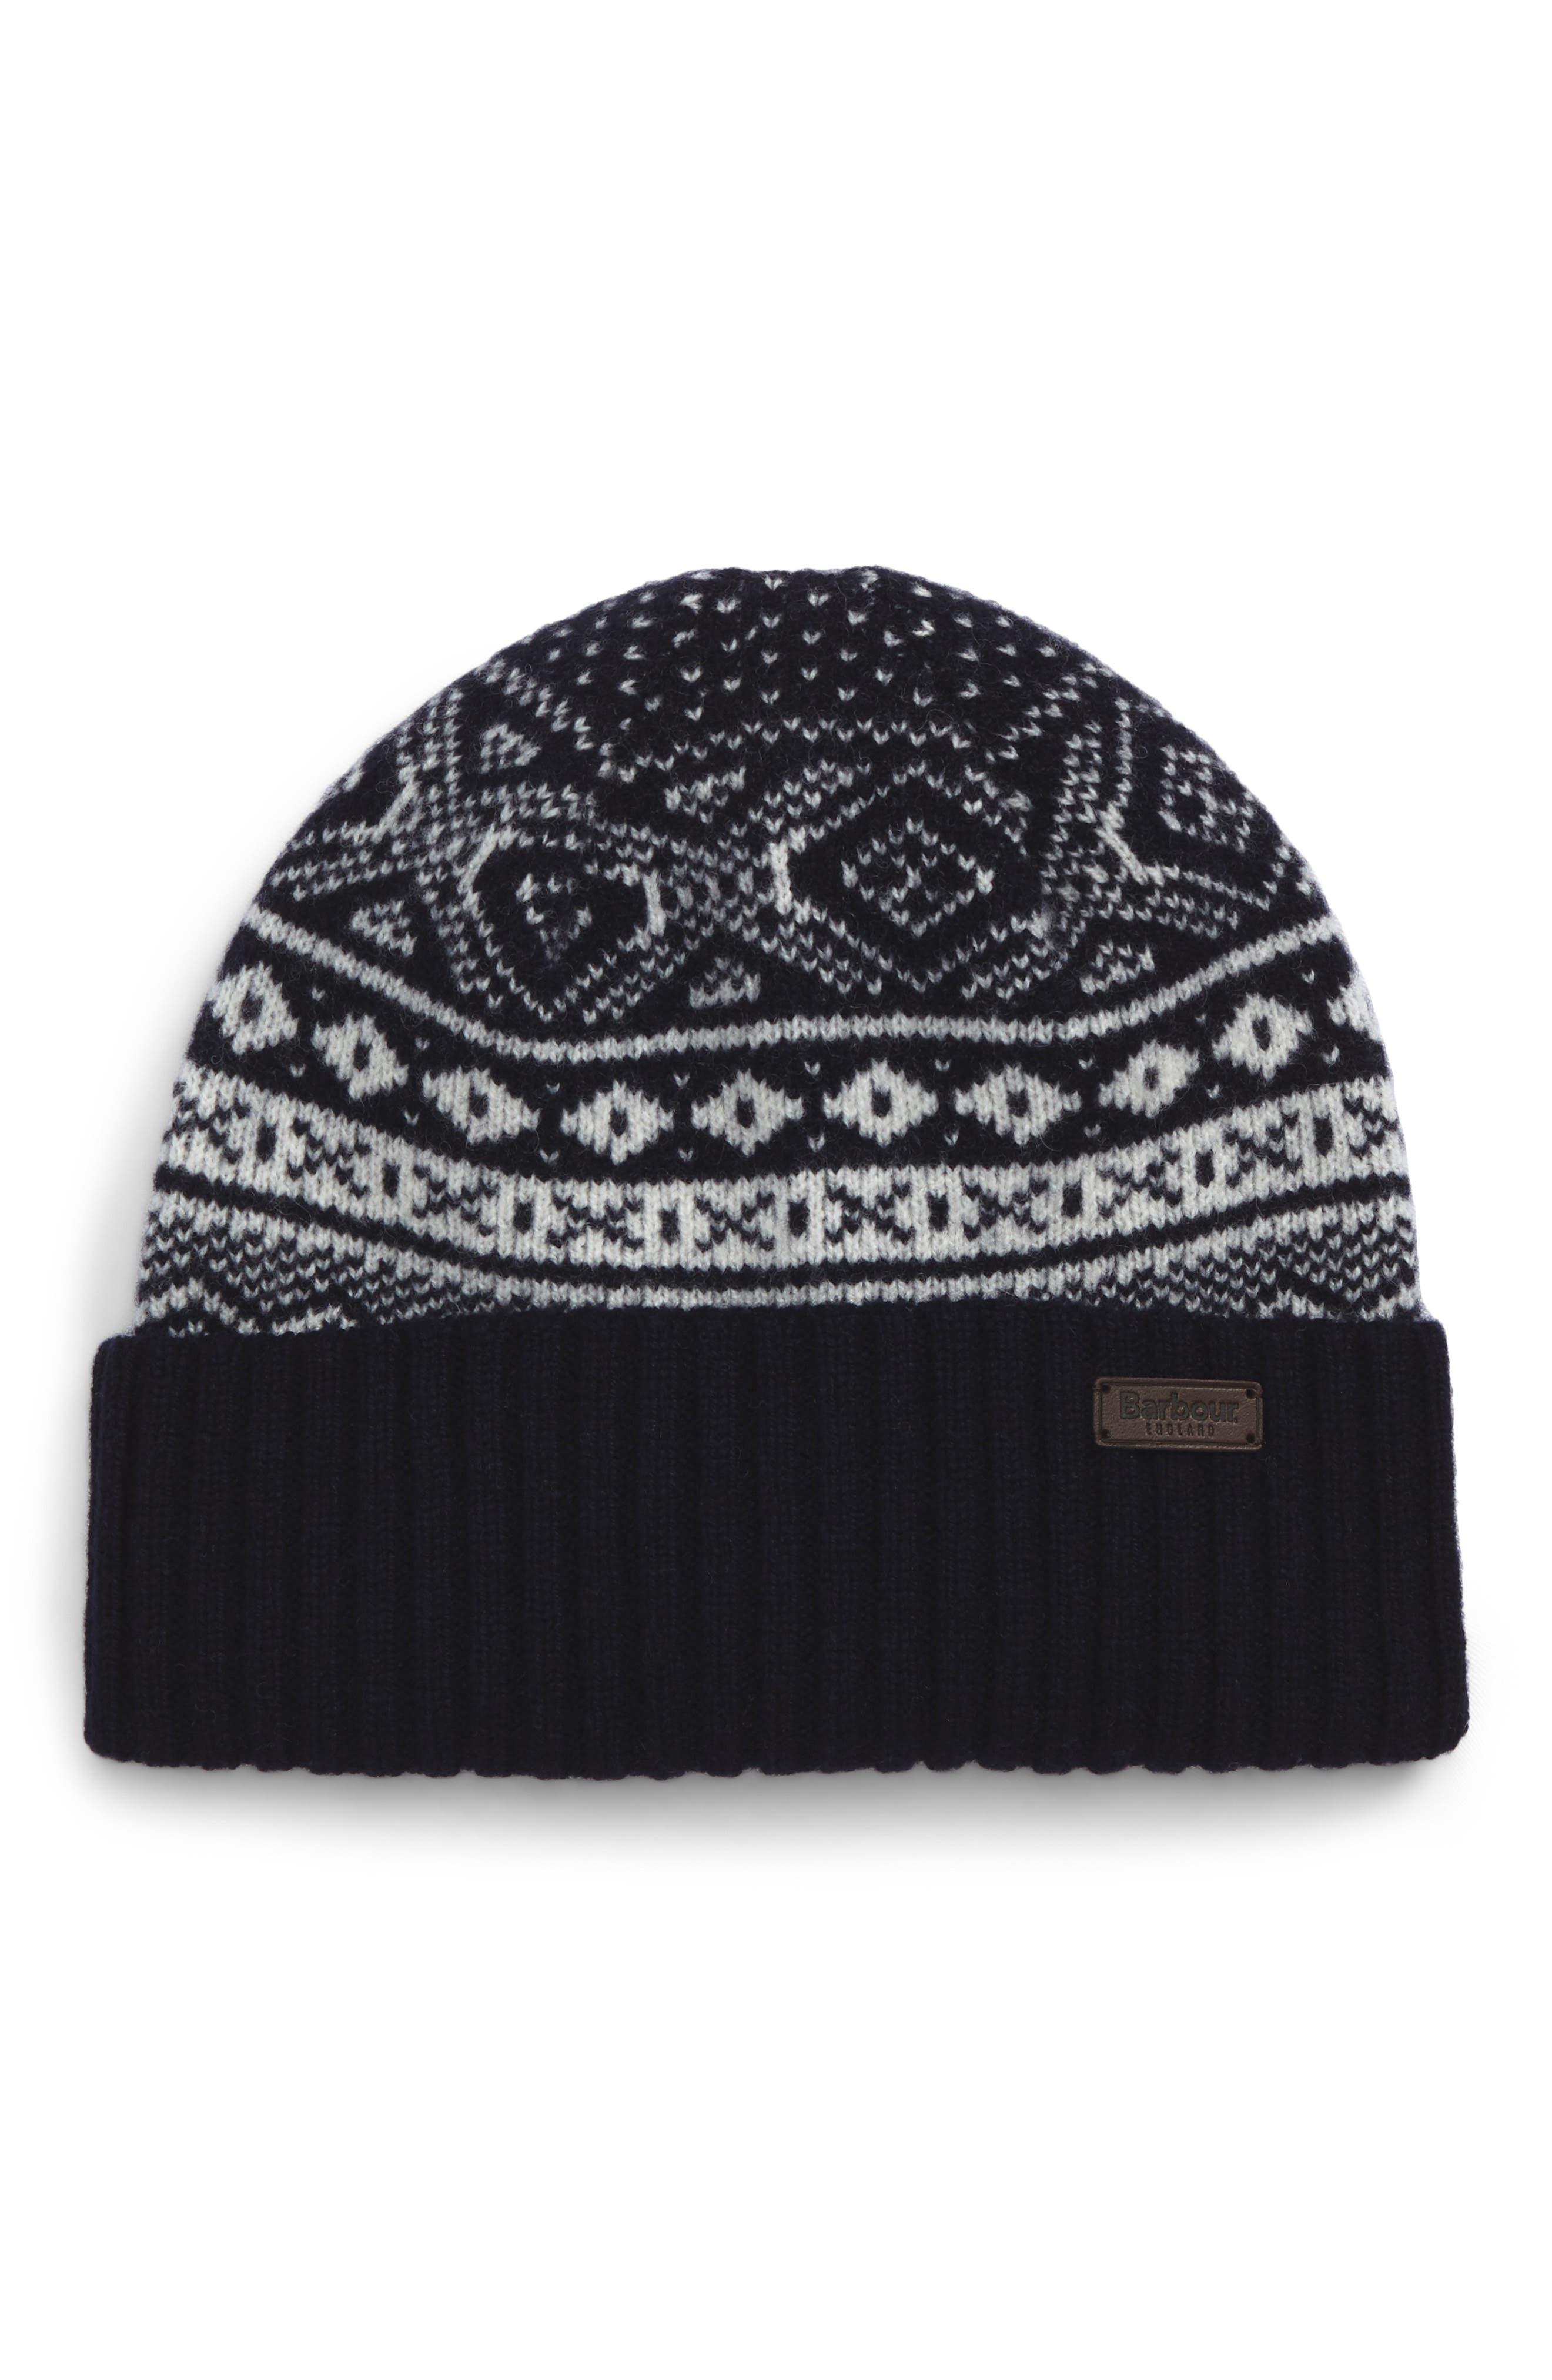 Barbour Gisburne Knit Wool Beanie